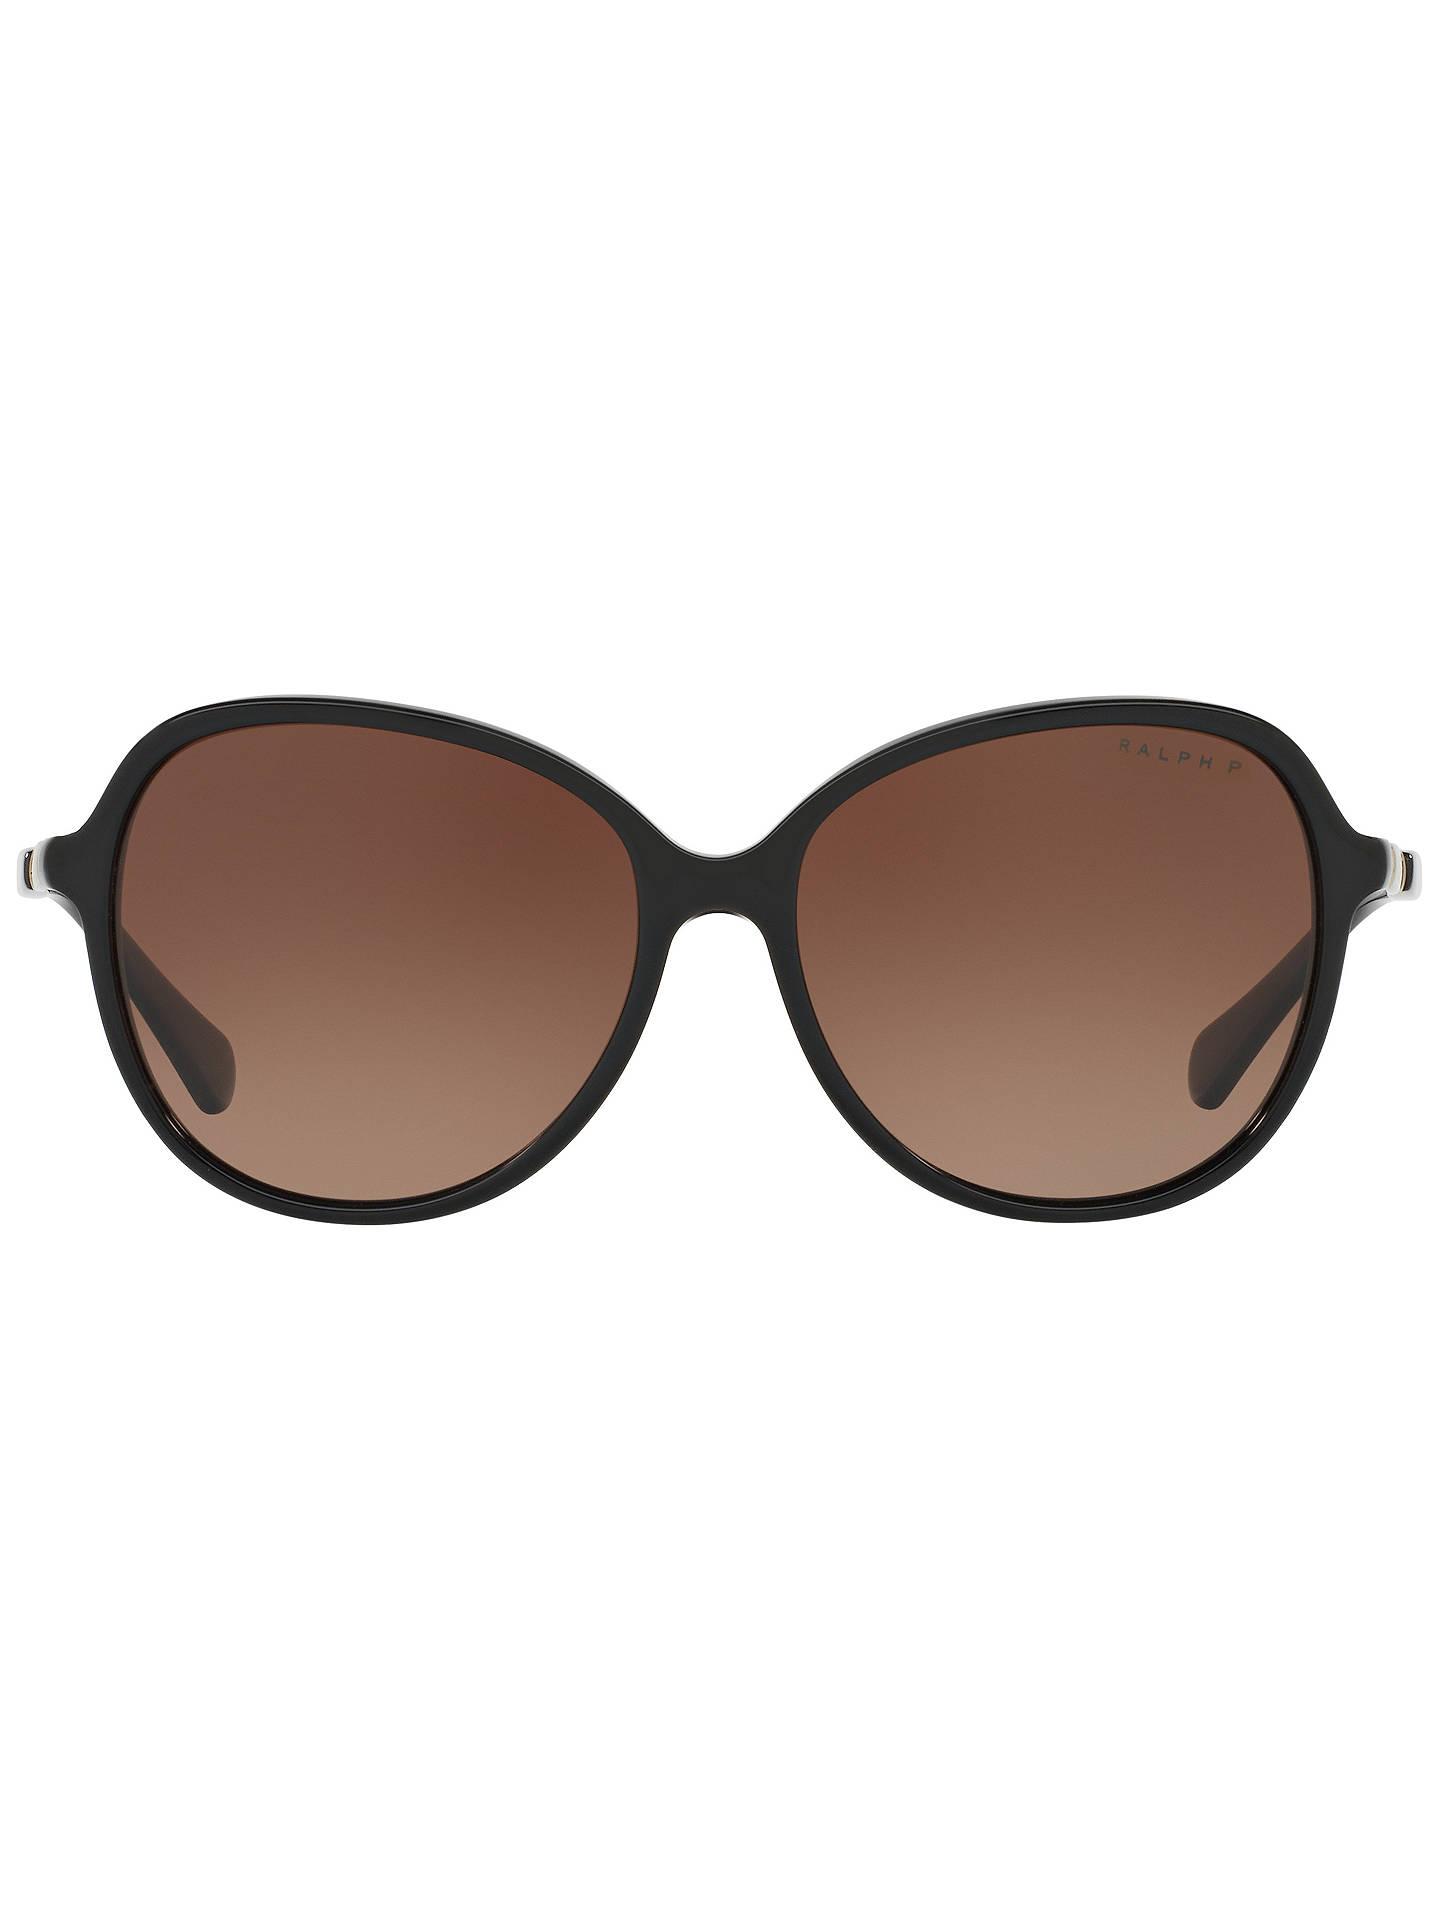 6c22e7a7da54 ... Buy Ralph RA5220 Women's Polarised Oversize Square Sunglasses, Matte  Black/Brown Gradient Online at ...